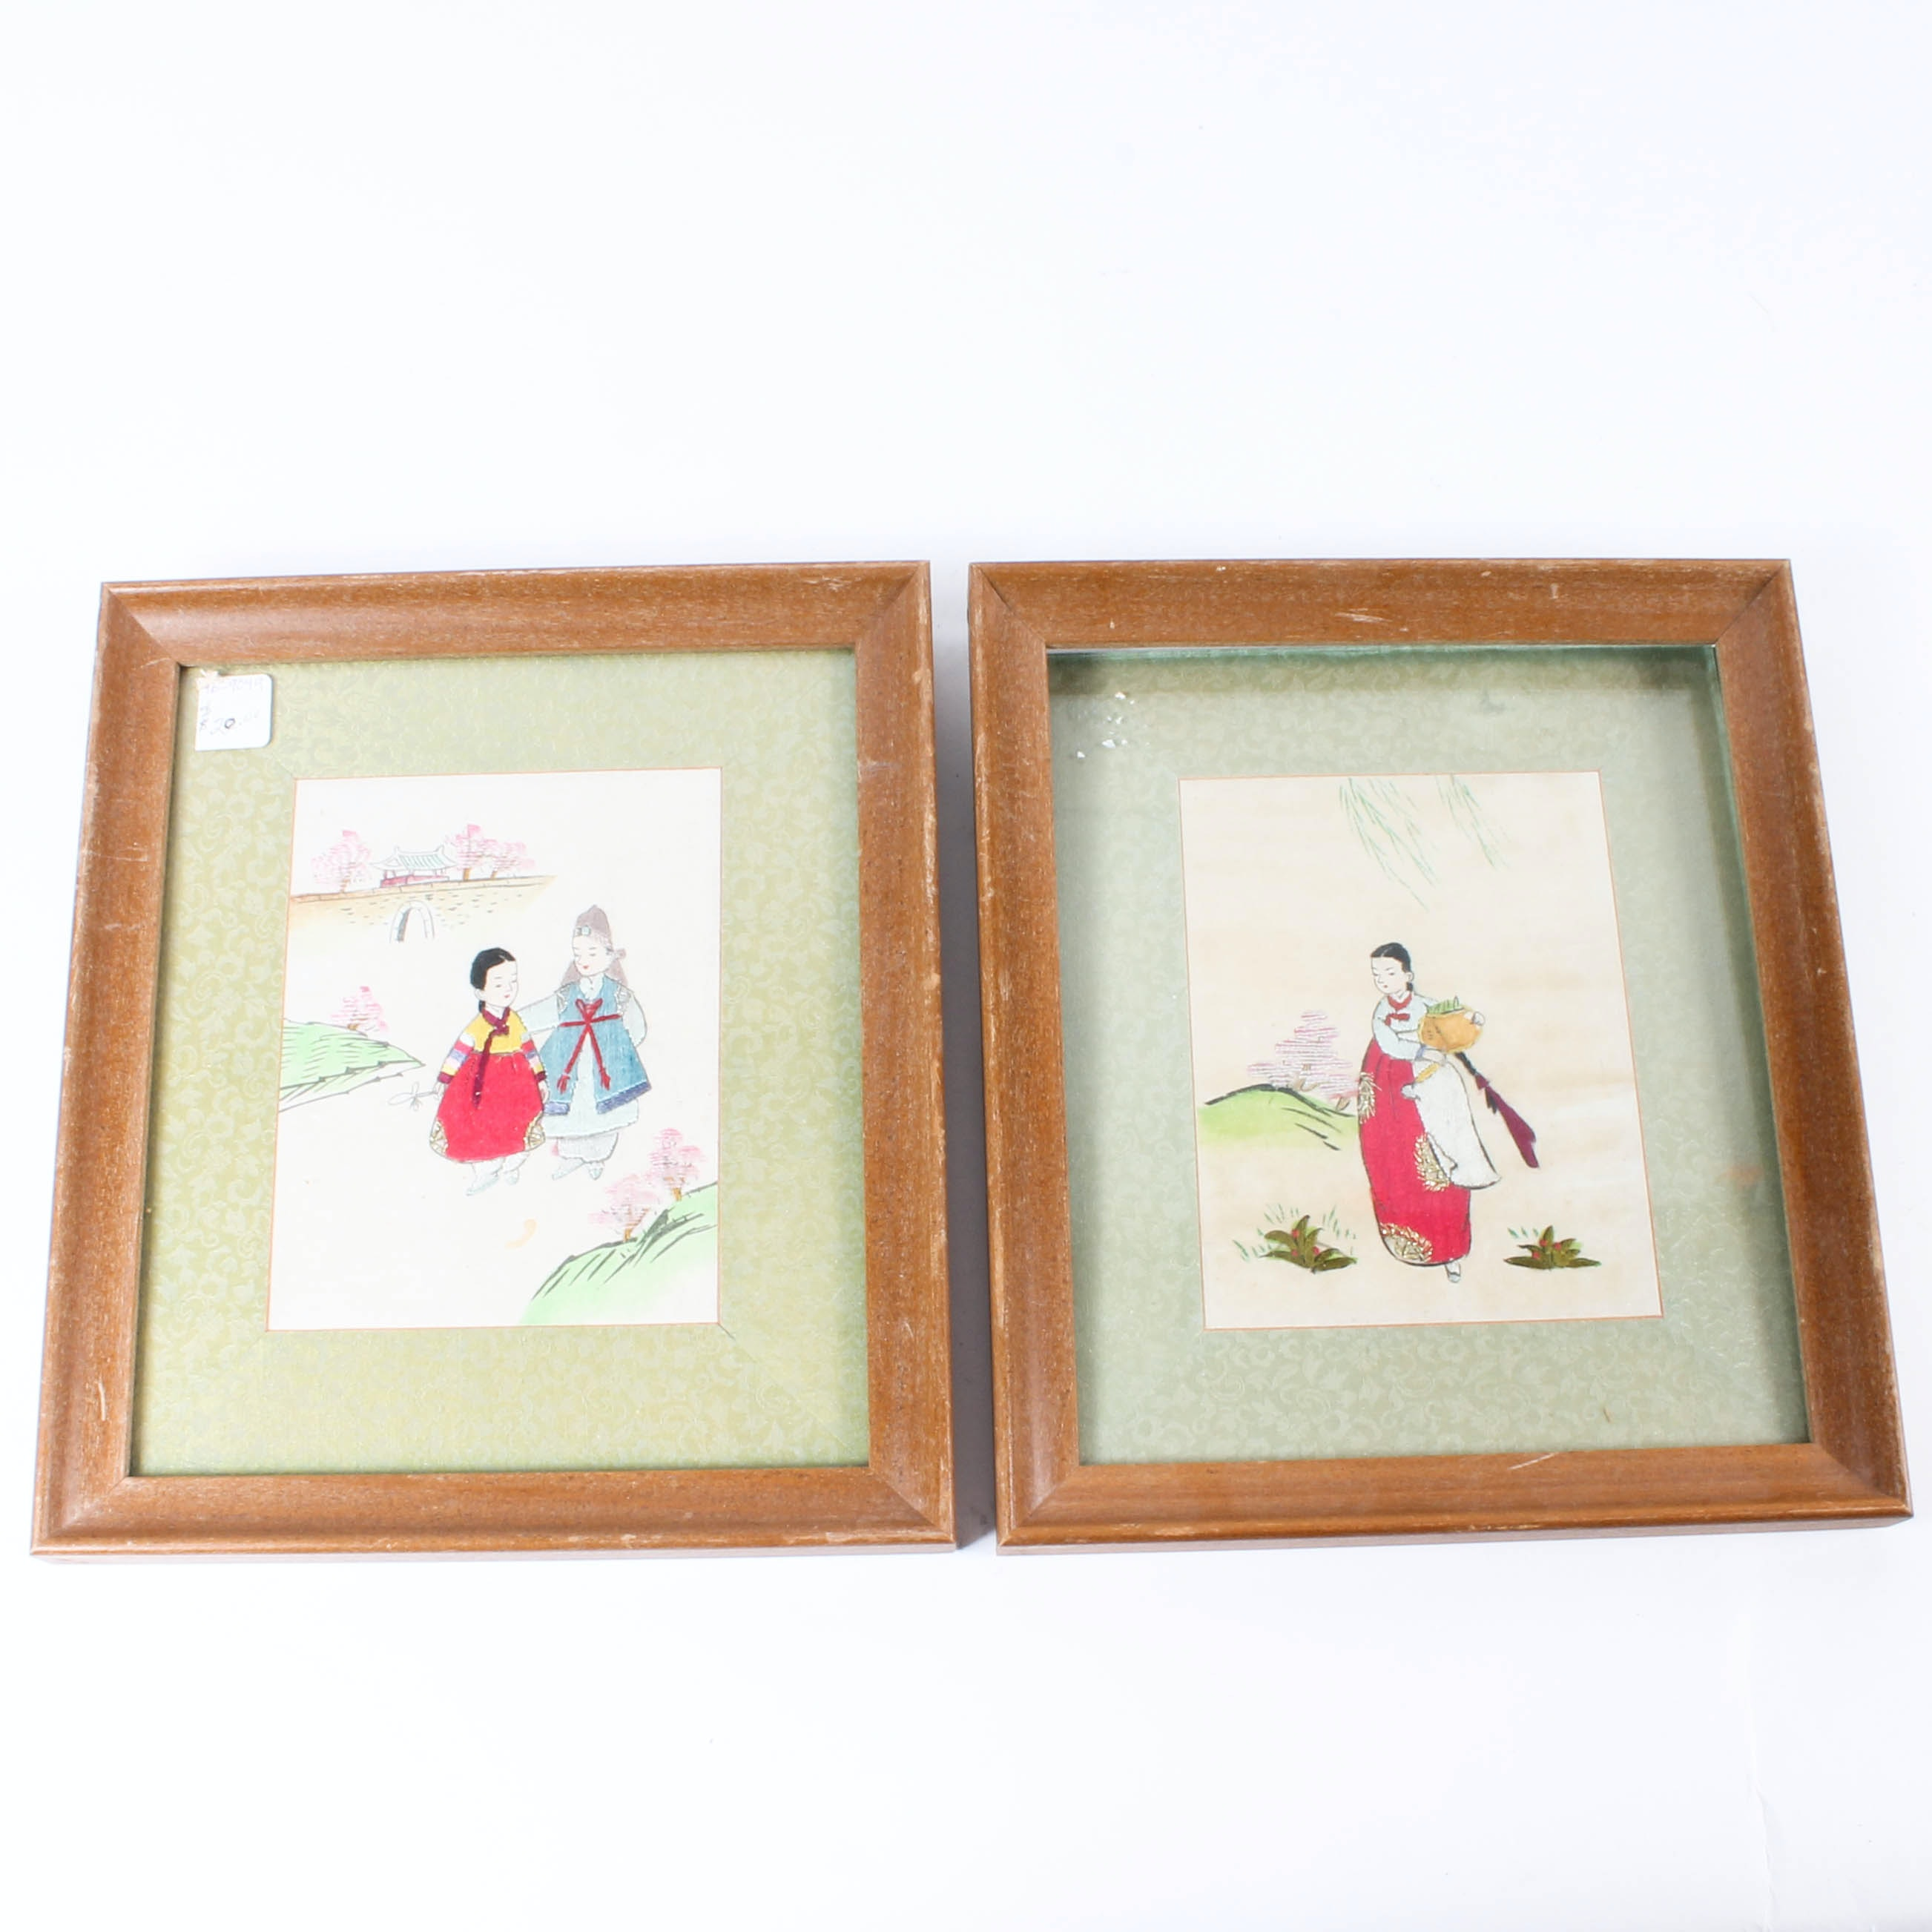 Pair of Framed Korean Embroideries